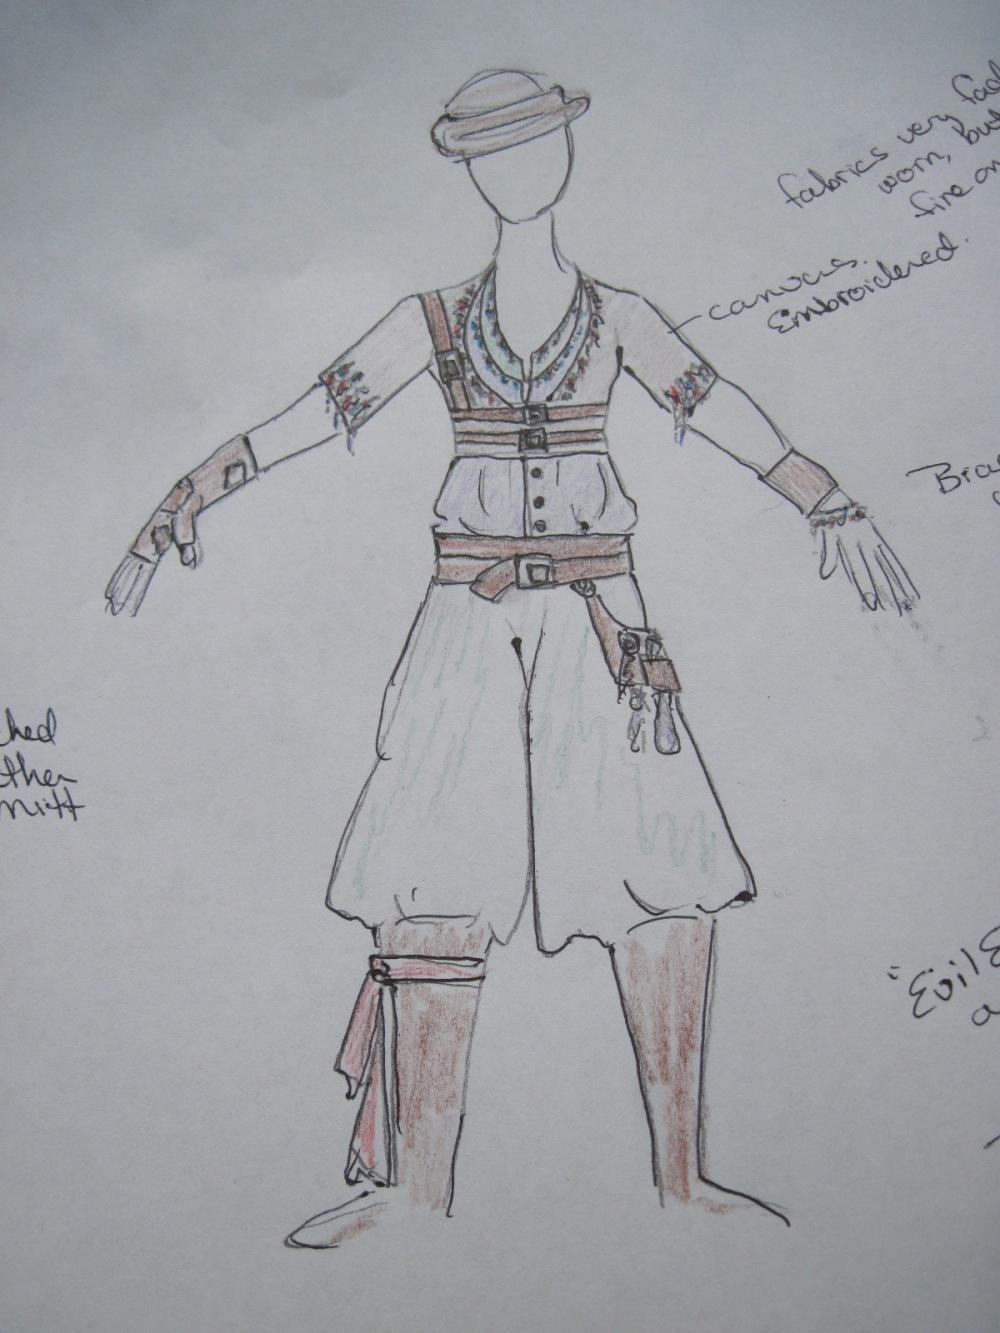 Thief sketch by Alisa Kester.